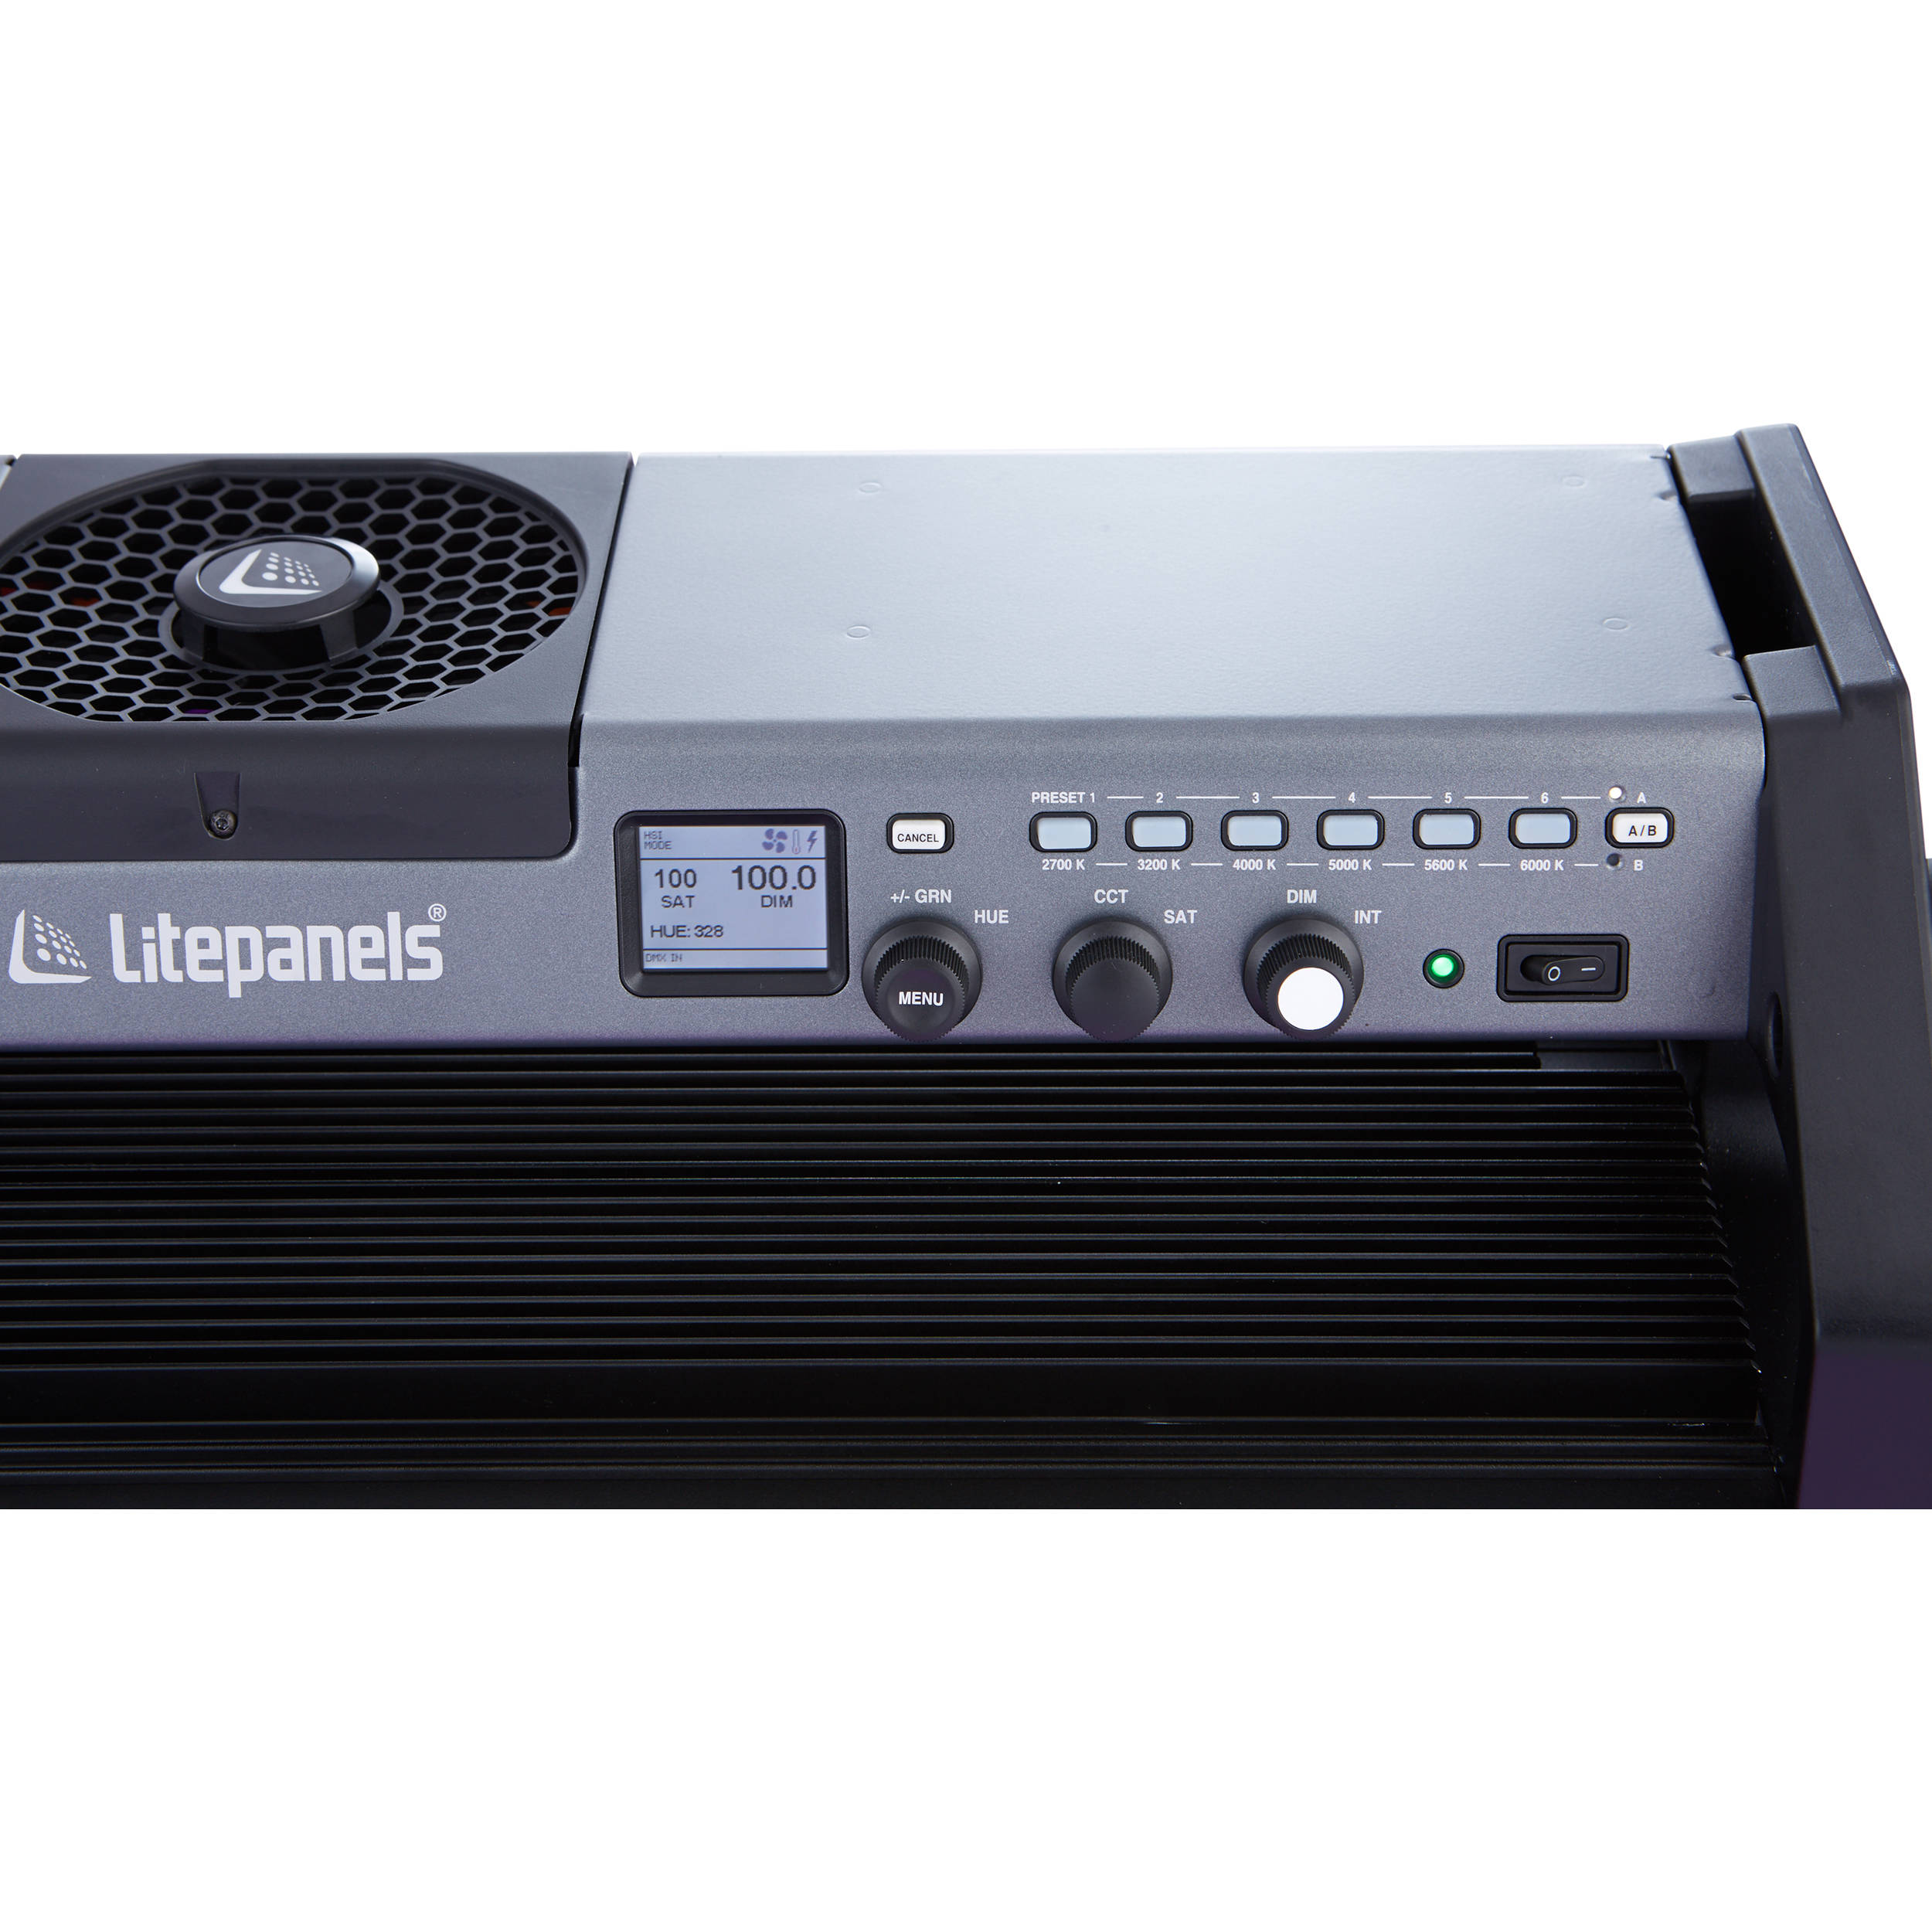 US powerCon Litepanels Gemini 2x1 Soft Panel